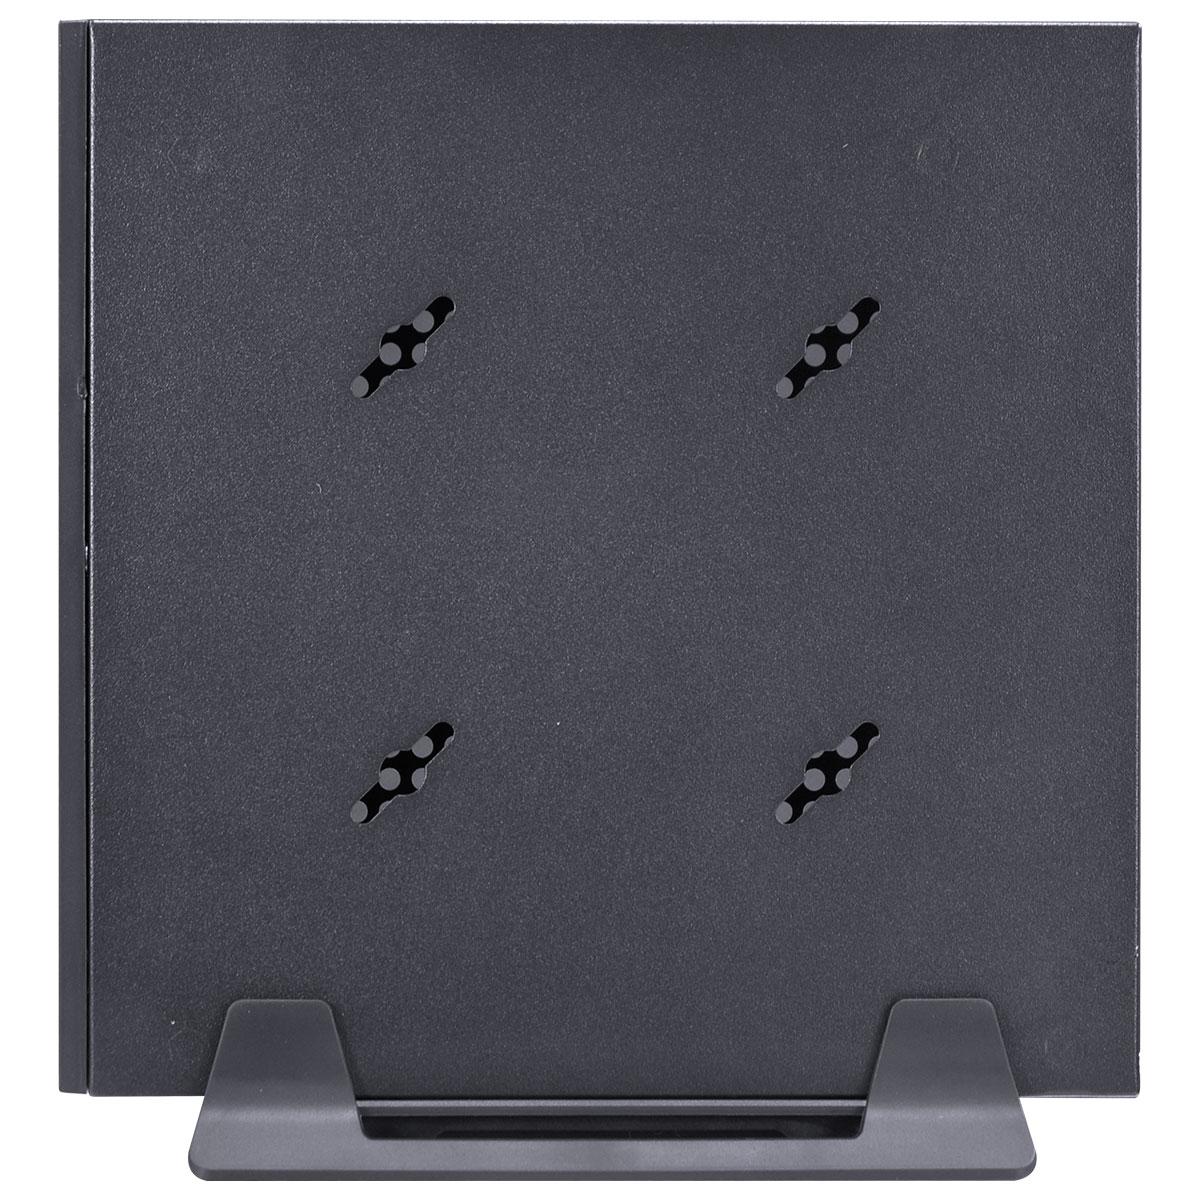 MINI COMPUTADOR BUSINESS B100 - CELERON DUAL CORE J1800 2.41GHZ 4GB DDR3 SODIMM SSD 120GB 1X SERIAL FONTE 60W WIN 10 PRO  - Audio Video & cia